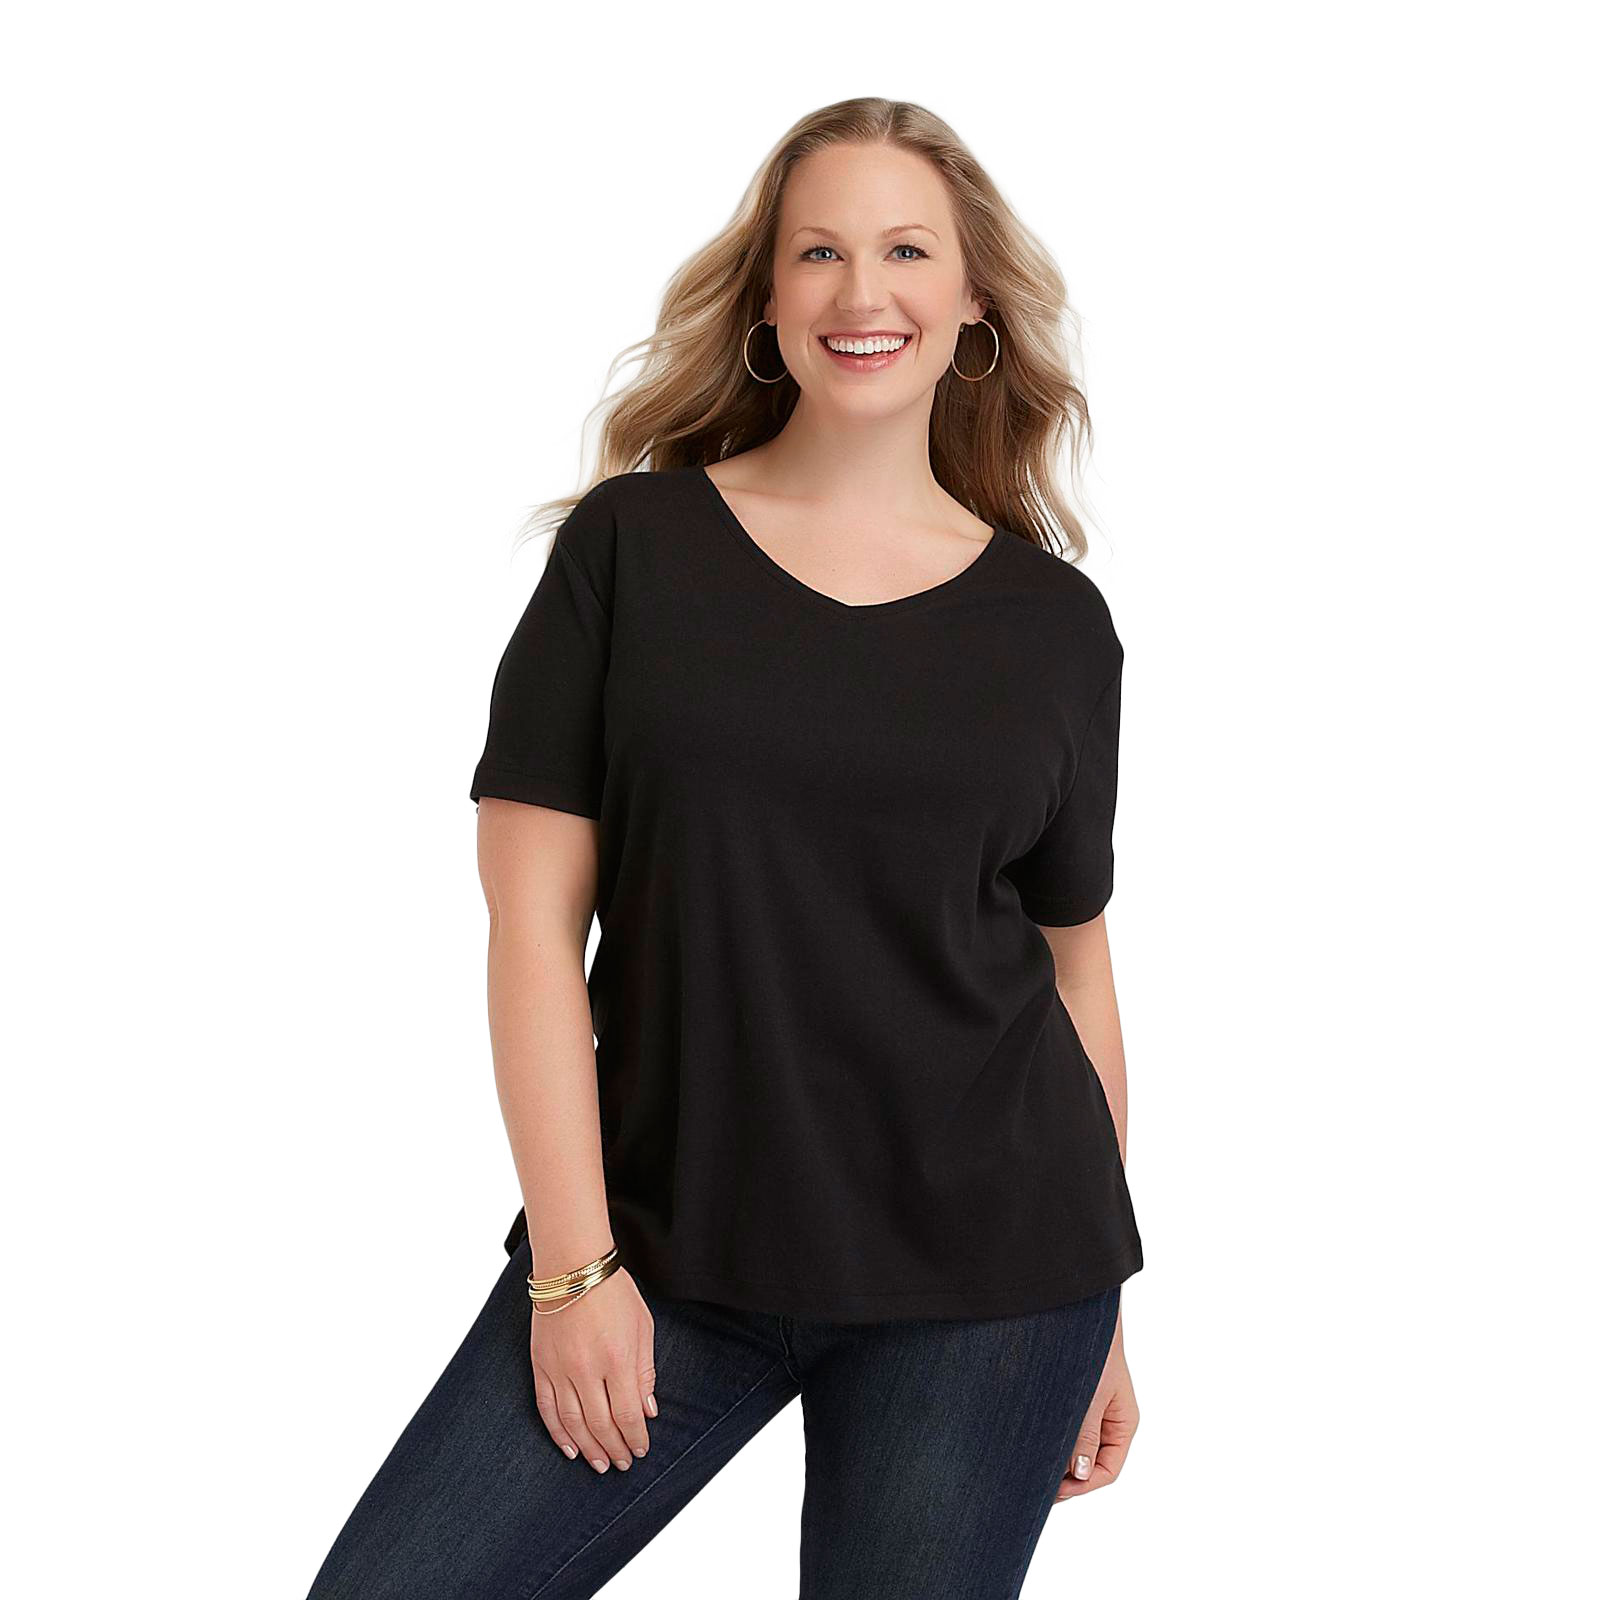 Laura scott women 39 s plus v neck t shirt shop your way for V neck t shirt online shopping